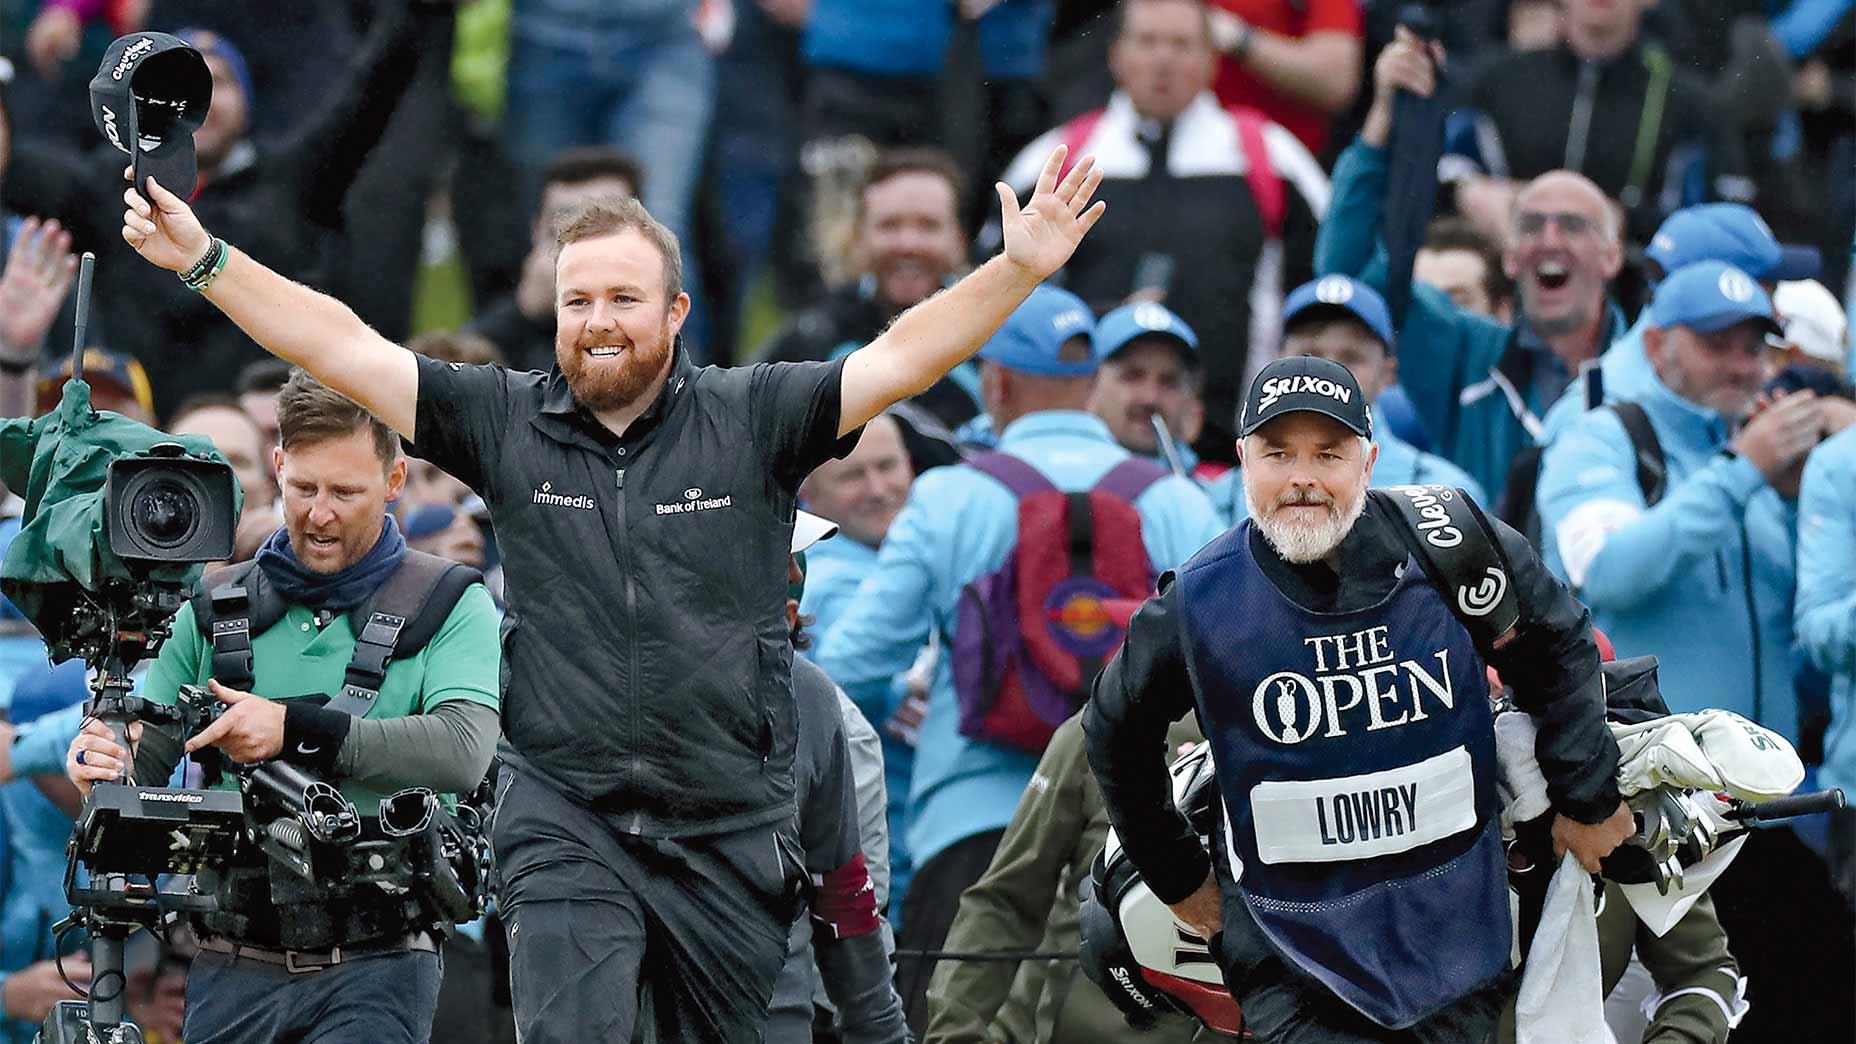 Shane Lowry celebrates winning the 2019 British Open.